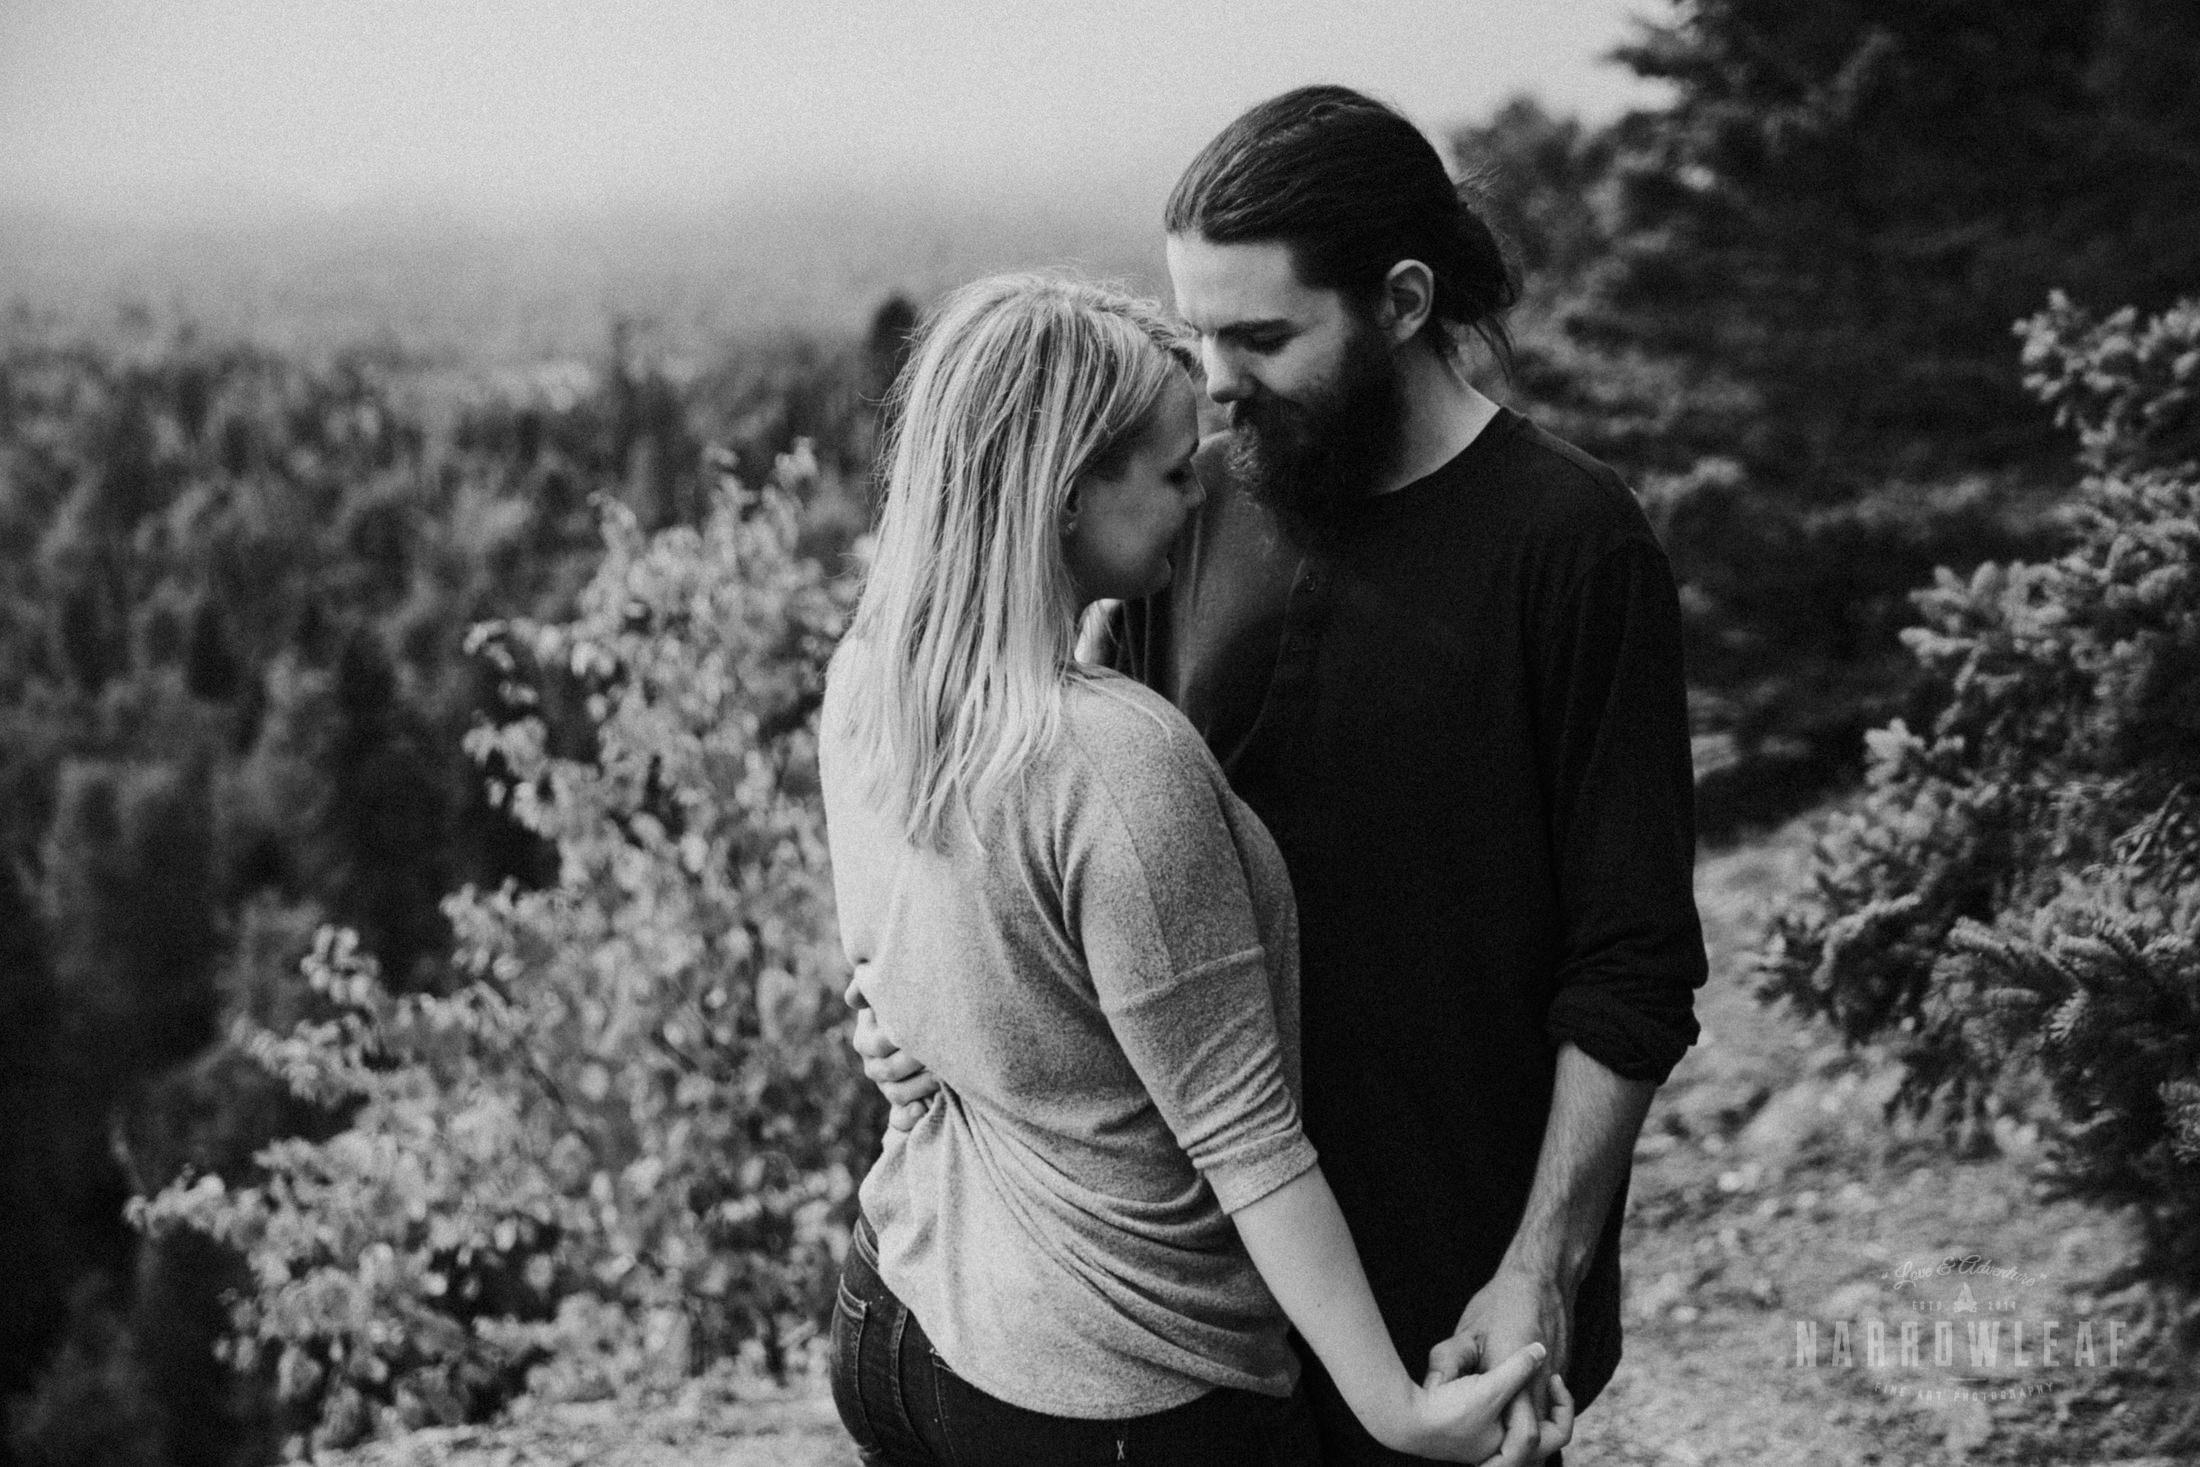 Minnesota-Hiking-Engagement-Photographer-Narrowleaf_Love_and_Adventure_Photography-Tettegouche-State-Park-7581.jpg